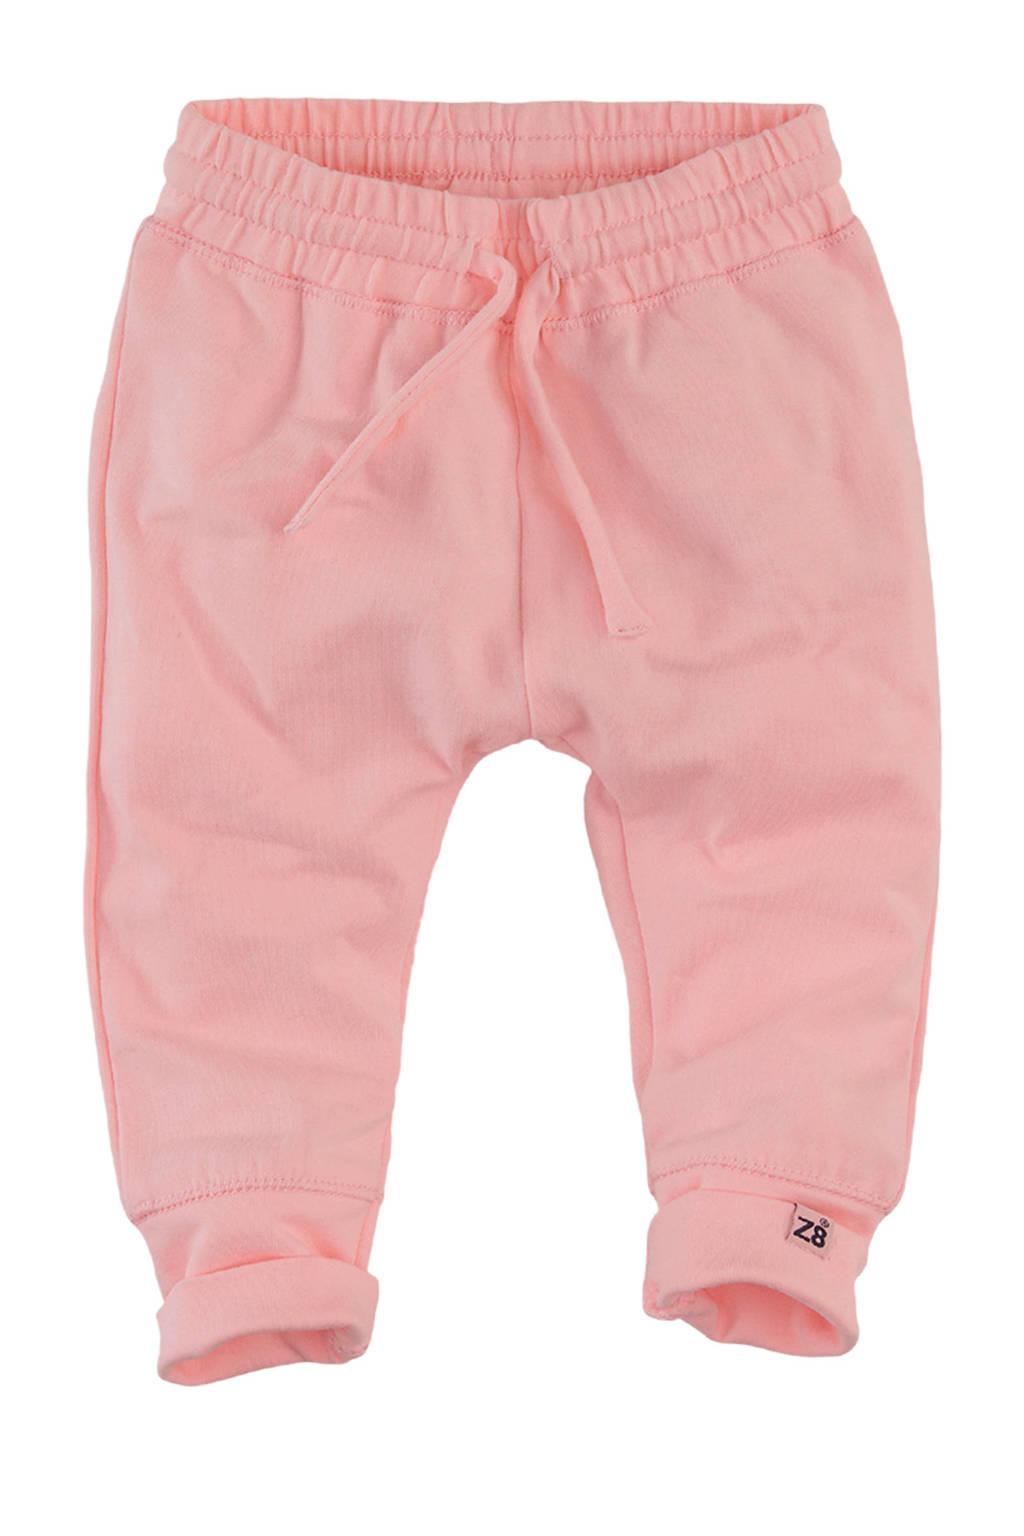 Z8 newborn joggingbroek Dodo roze, Roze